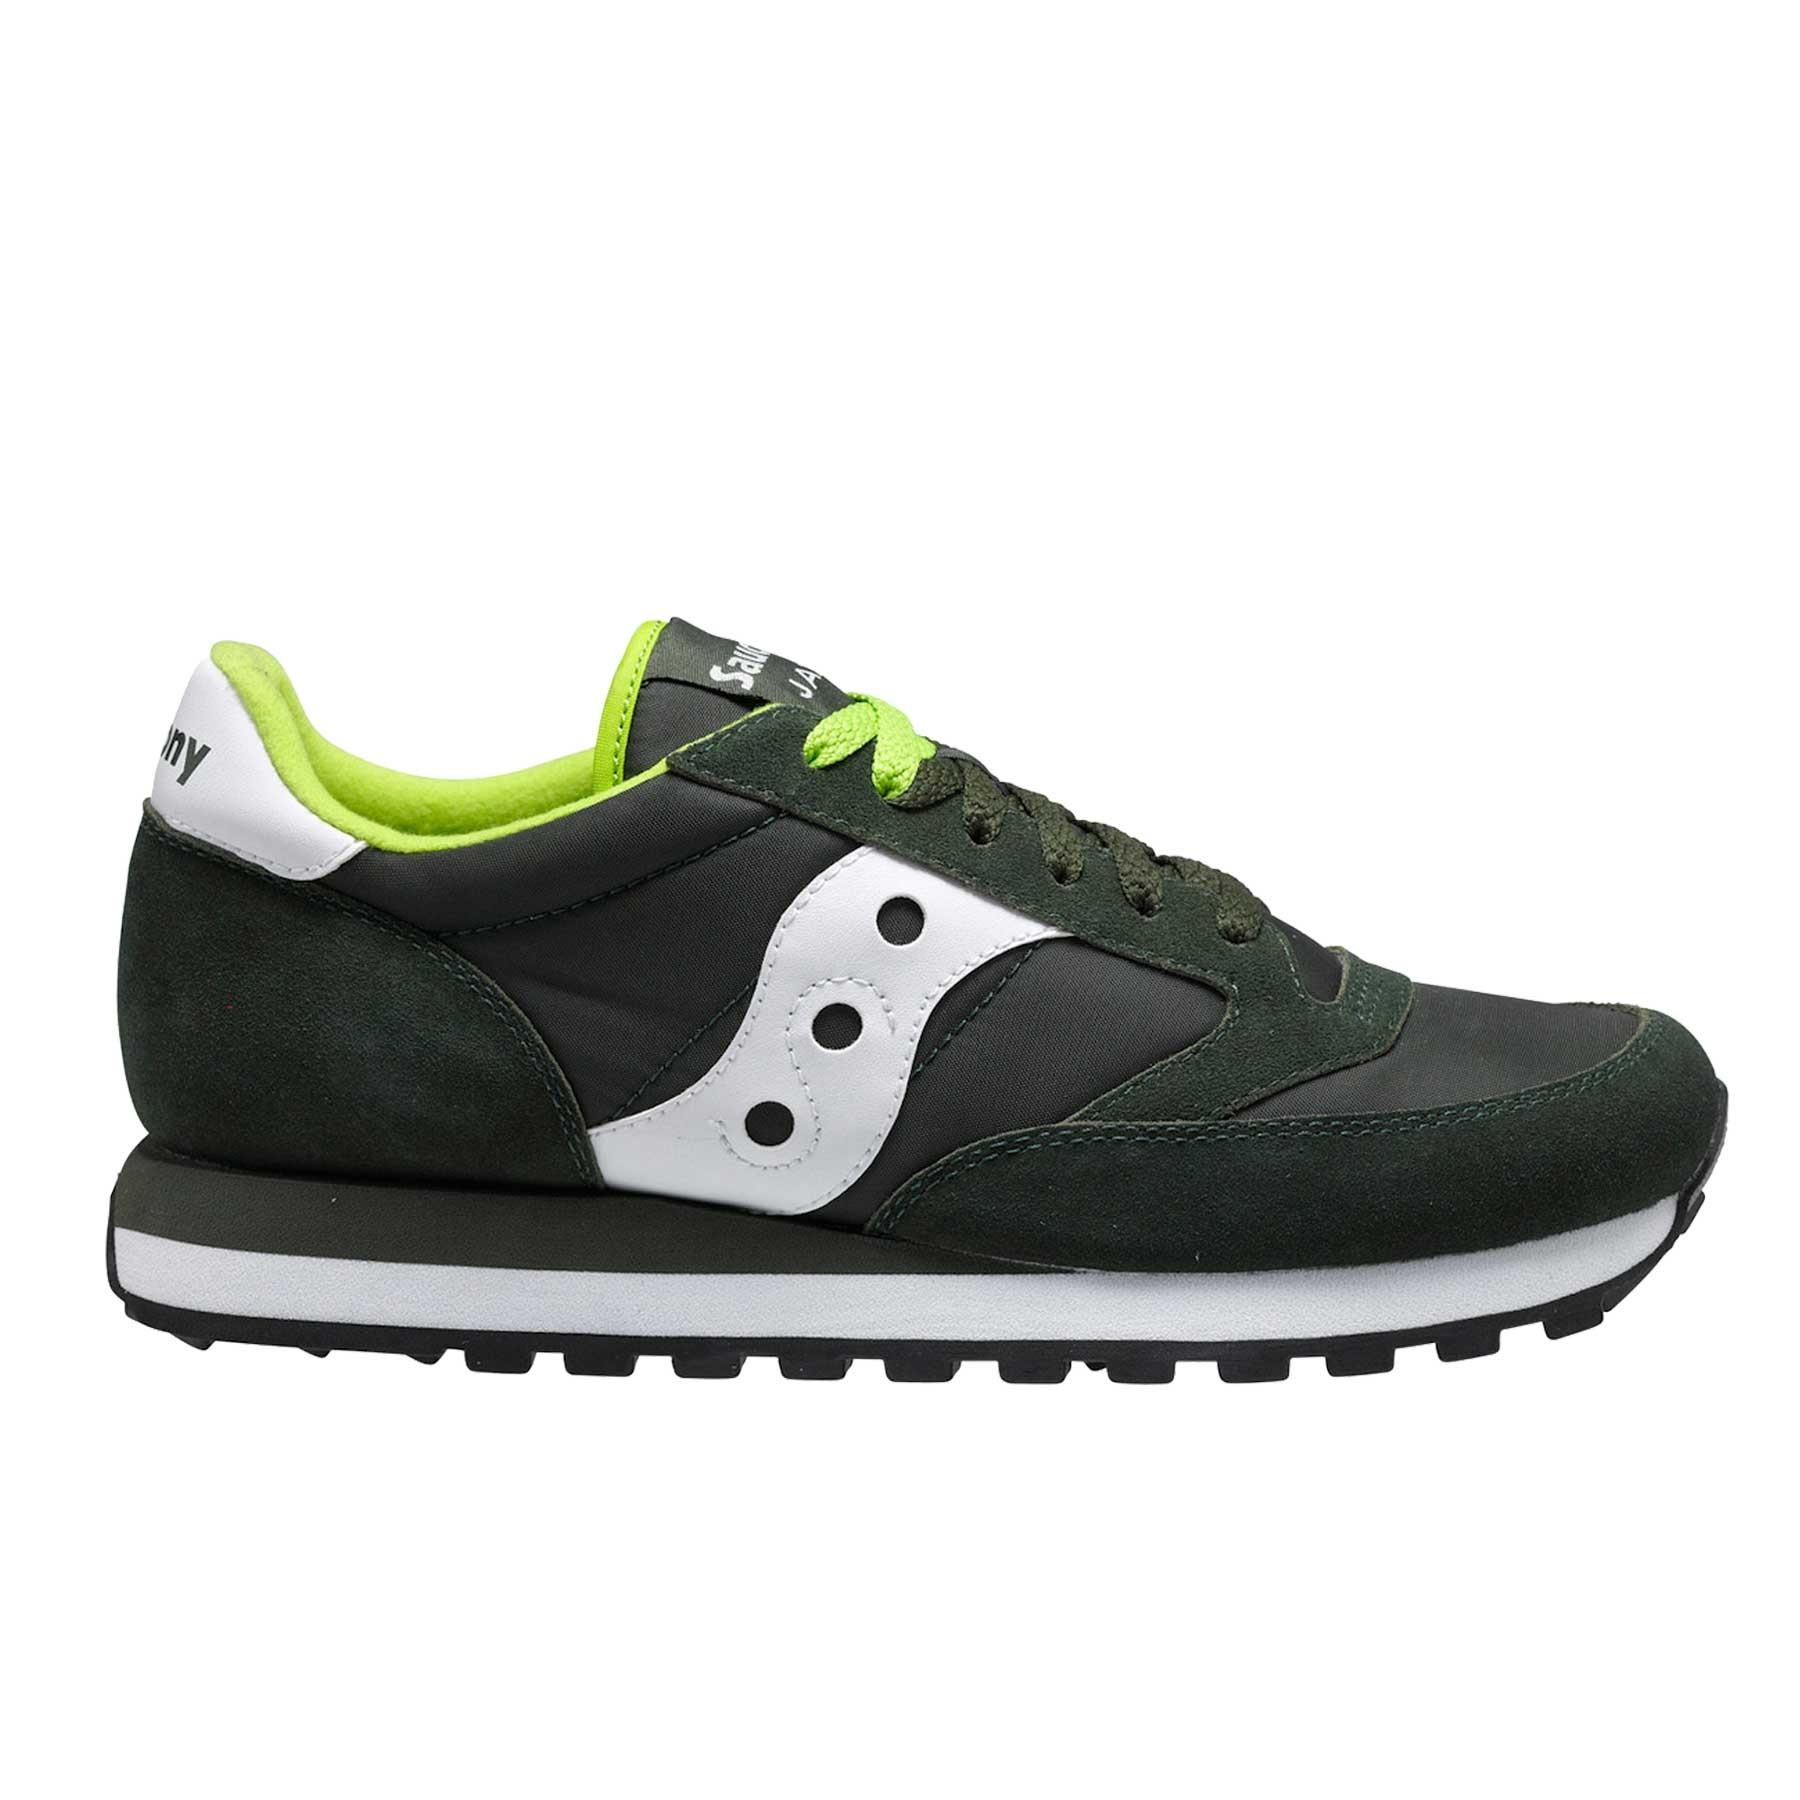 Sneaker Saucony Originals: scoprile da Maxi Sport